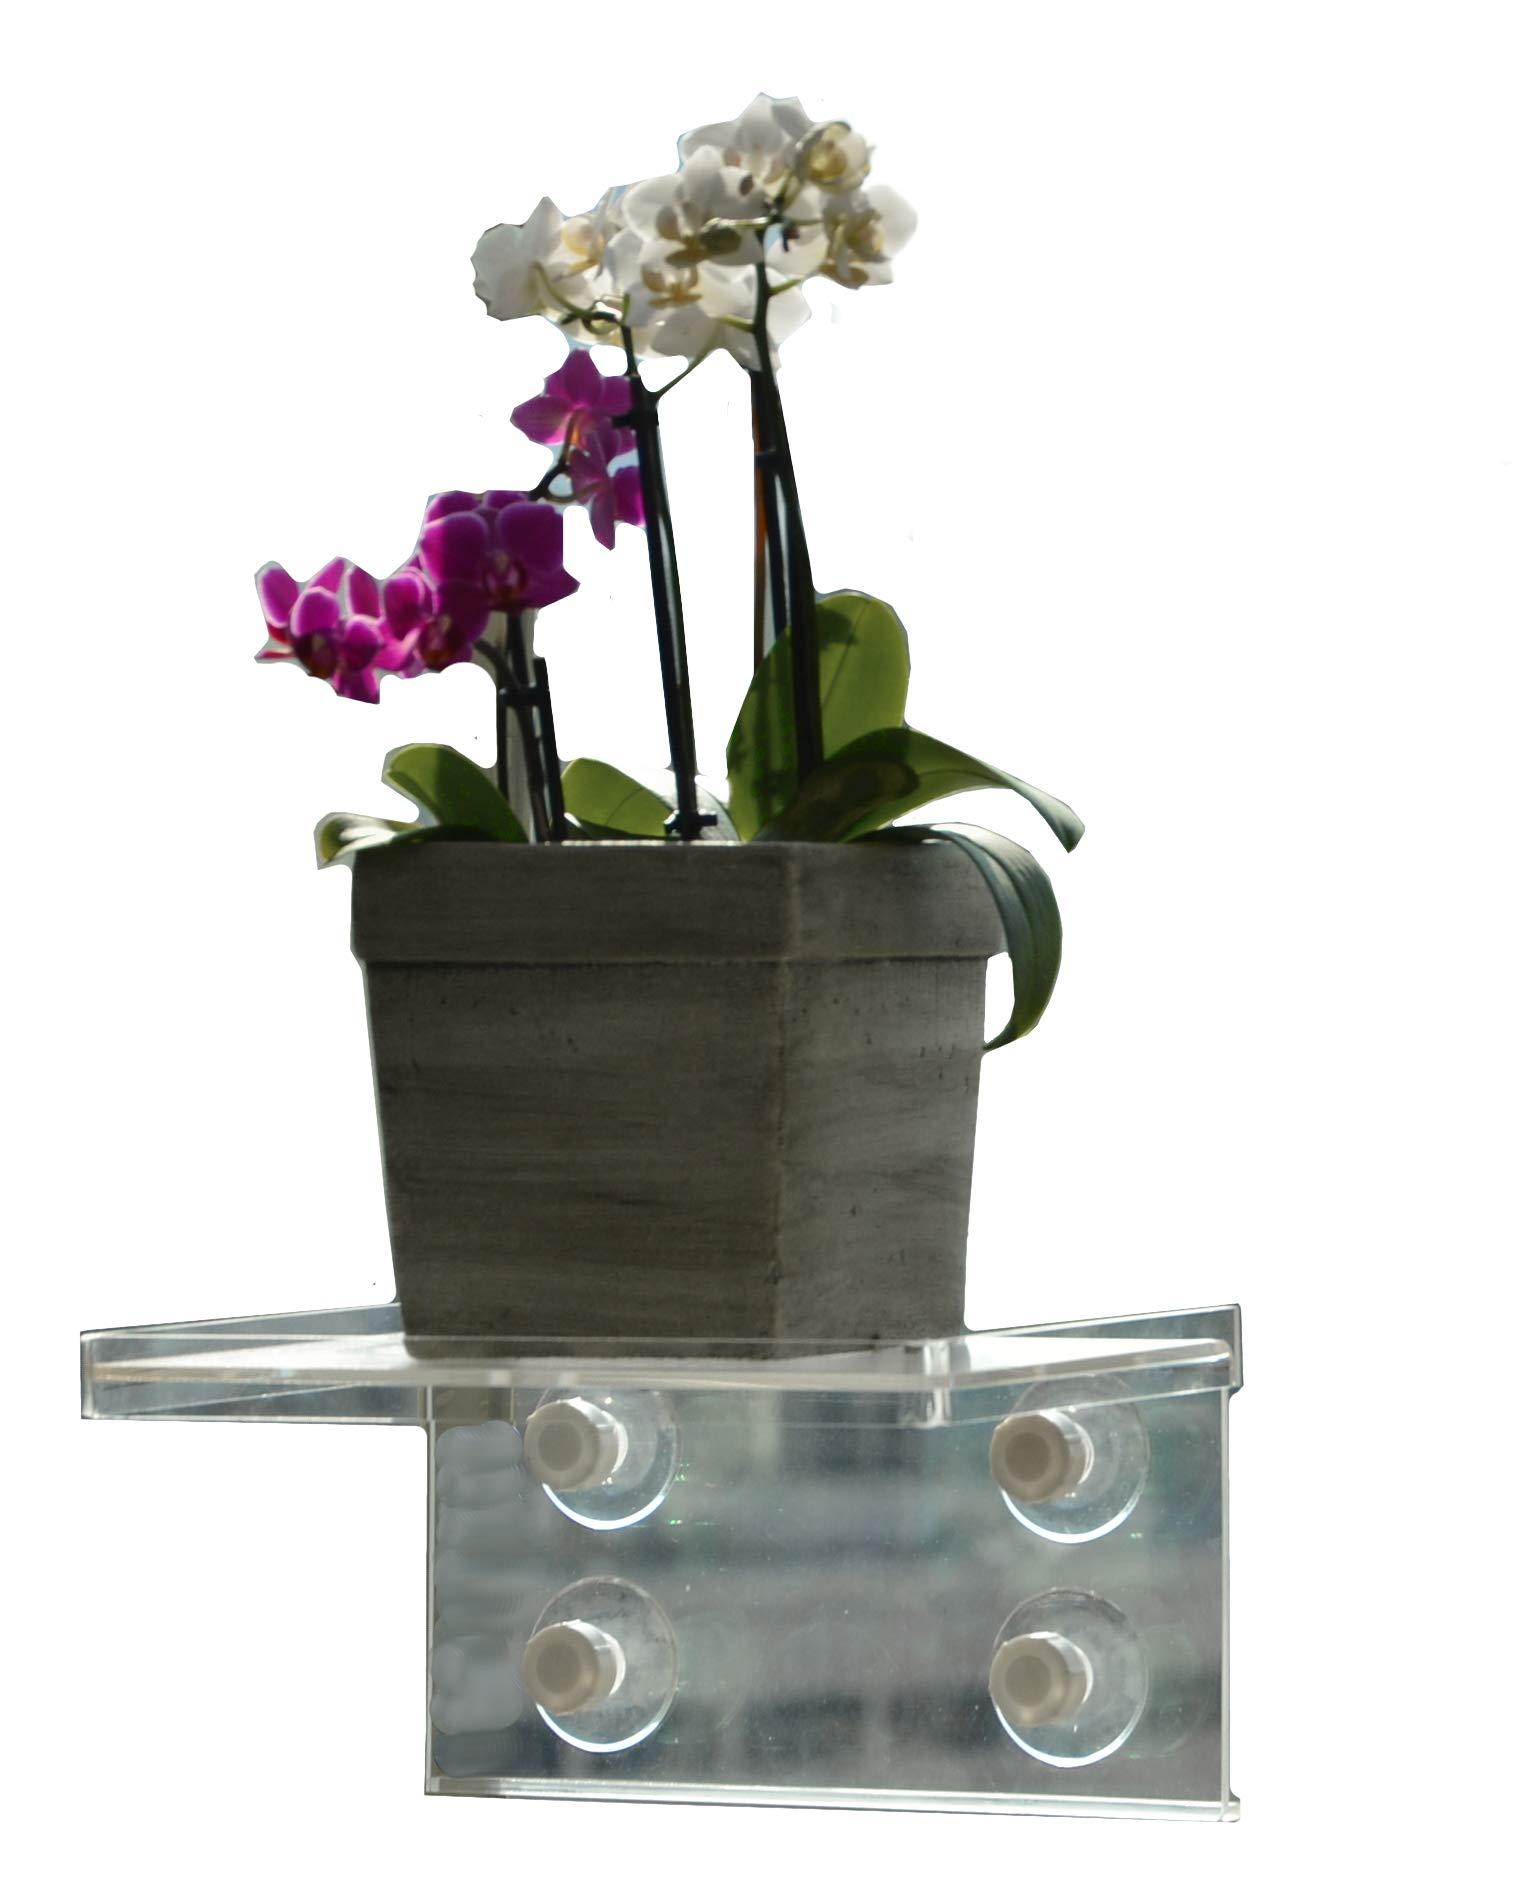 LaBrinx Designs Extra Deep Window Sill Suction Cup Shelf by LaBrinx Designs